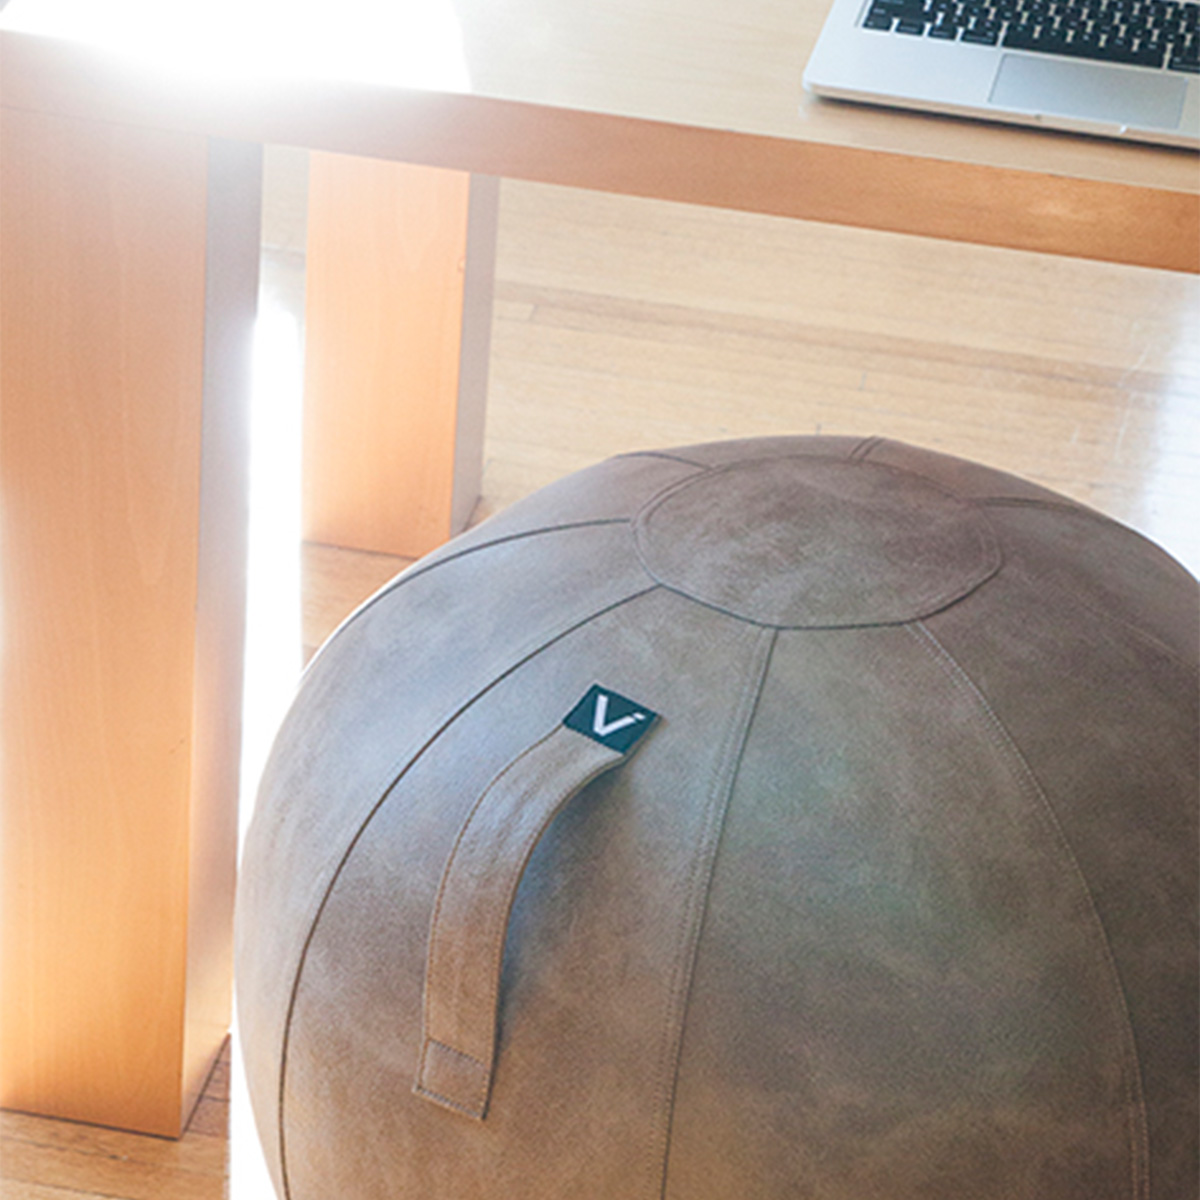 VIVORA/ヴィヴォラシーティングボール ルーノ レザーレット